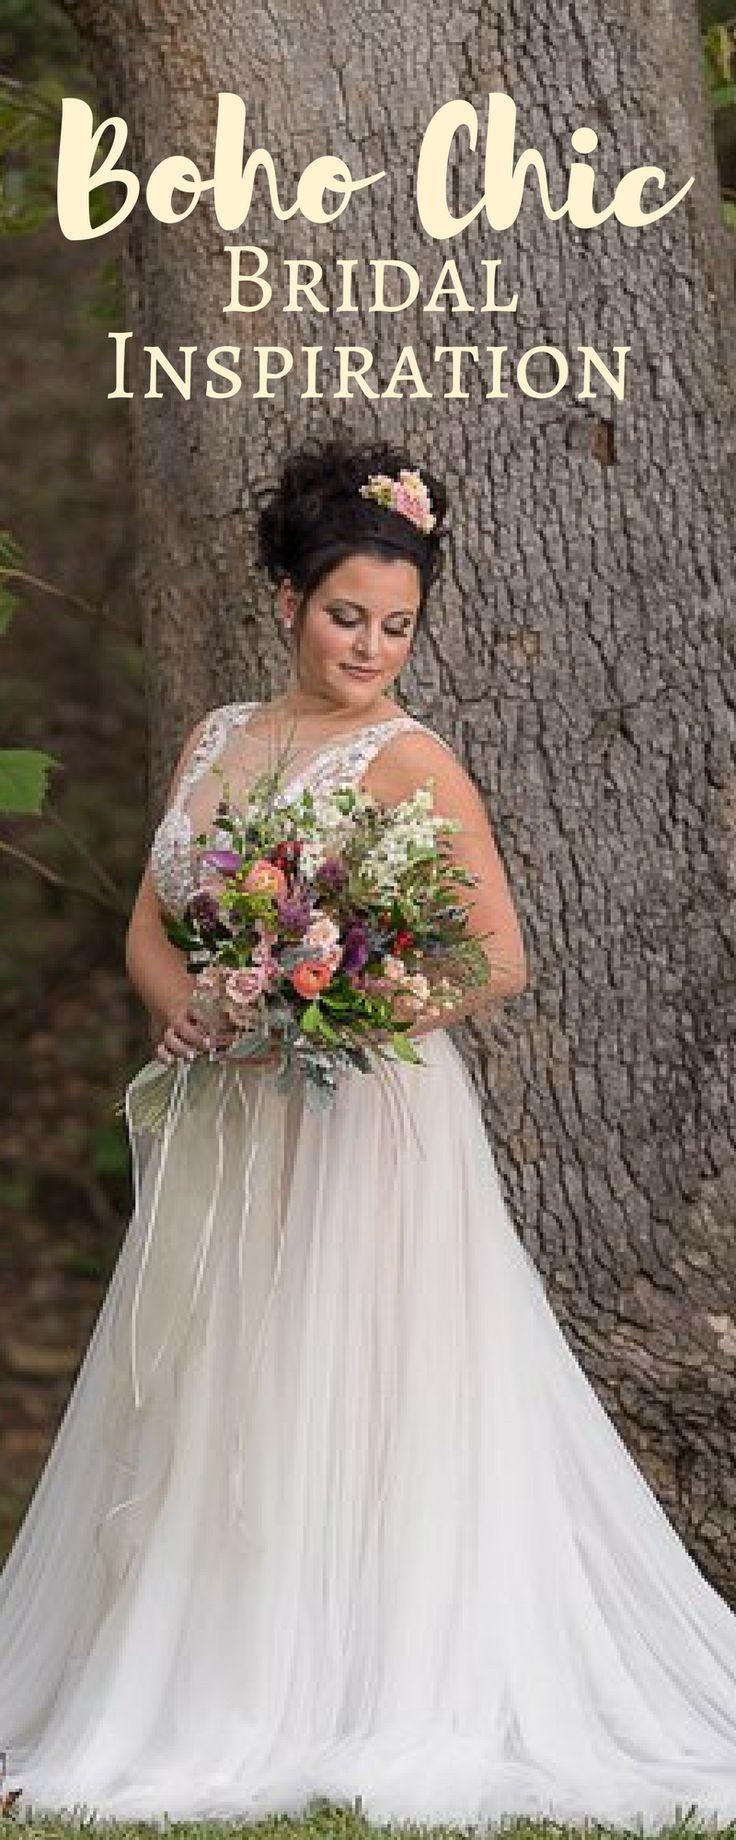 Boho chic bridal inspiration nontraditional wedding diy wedding